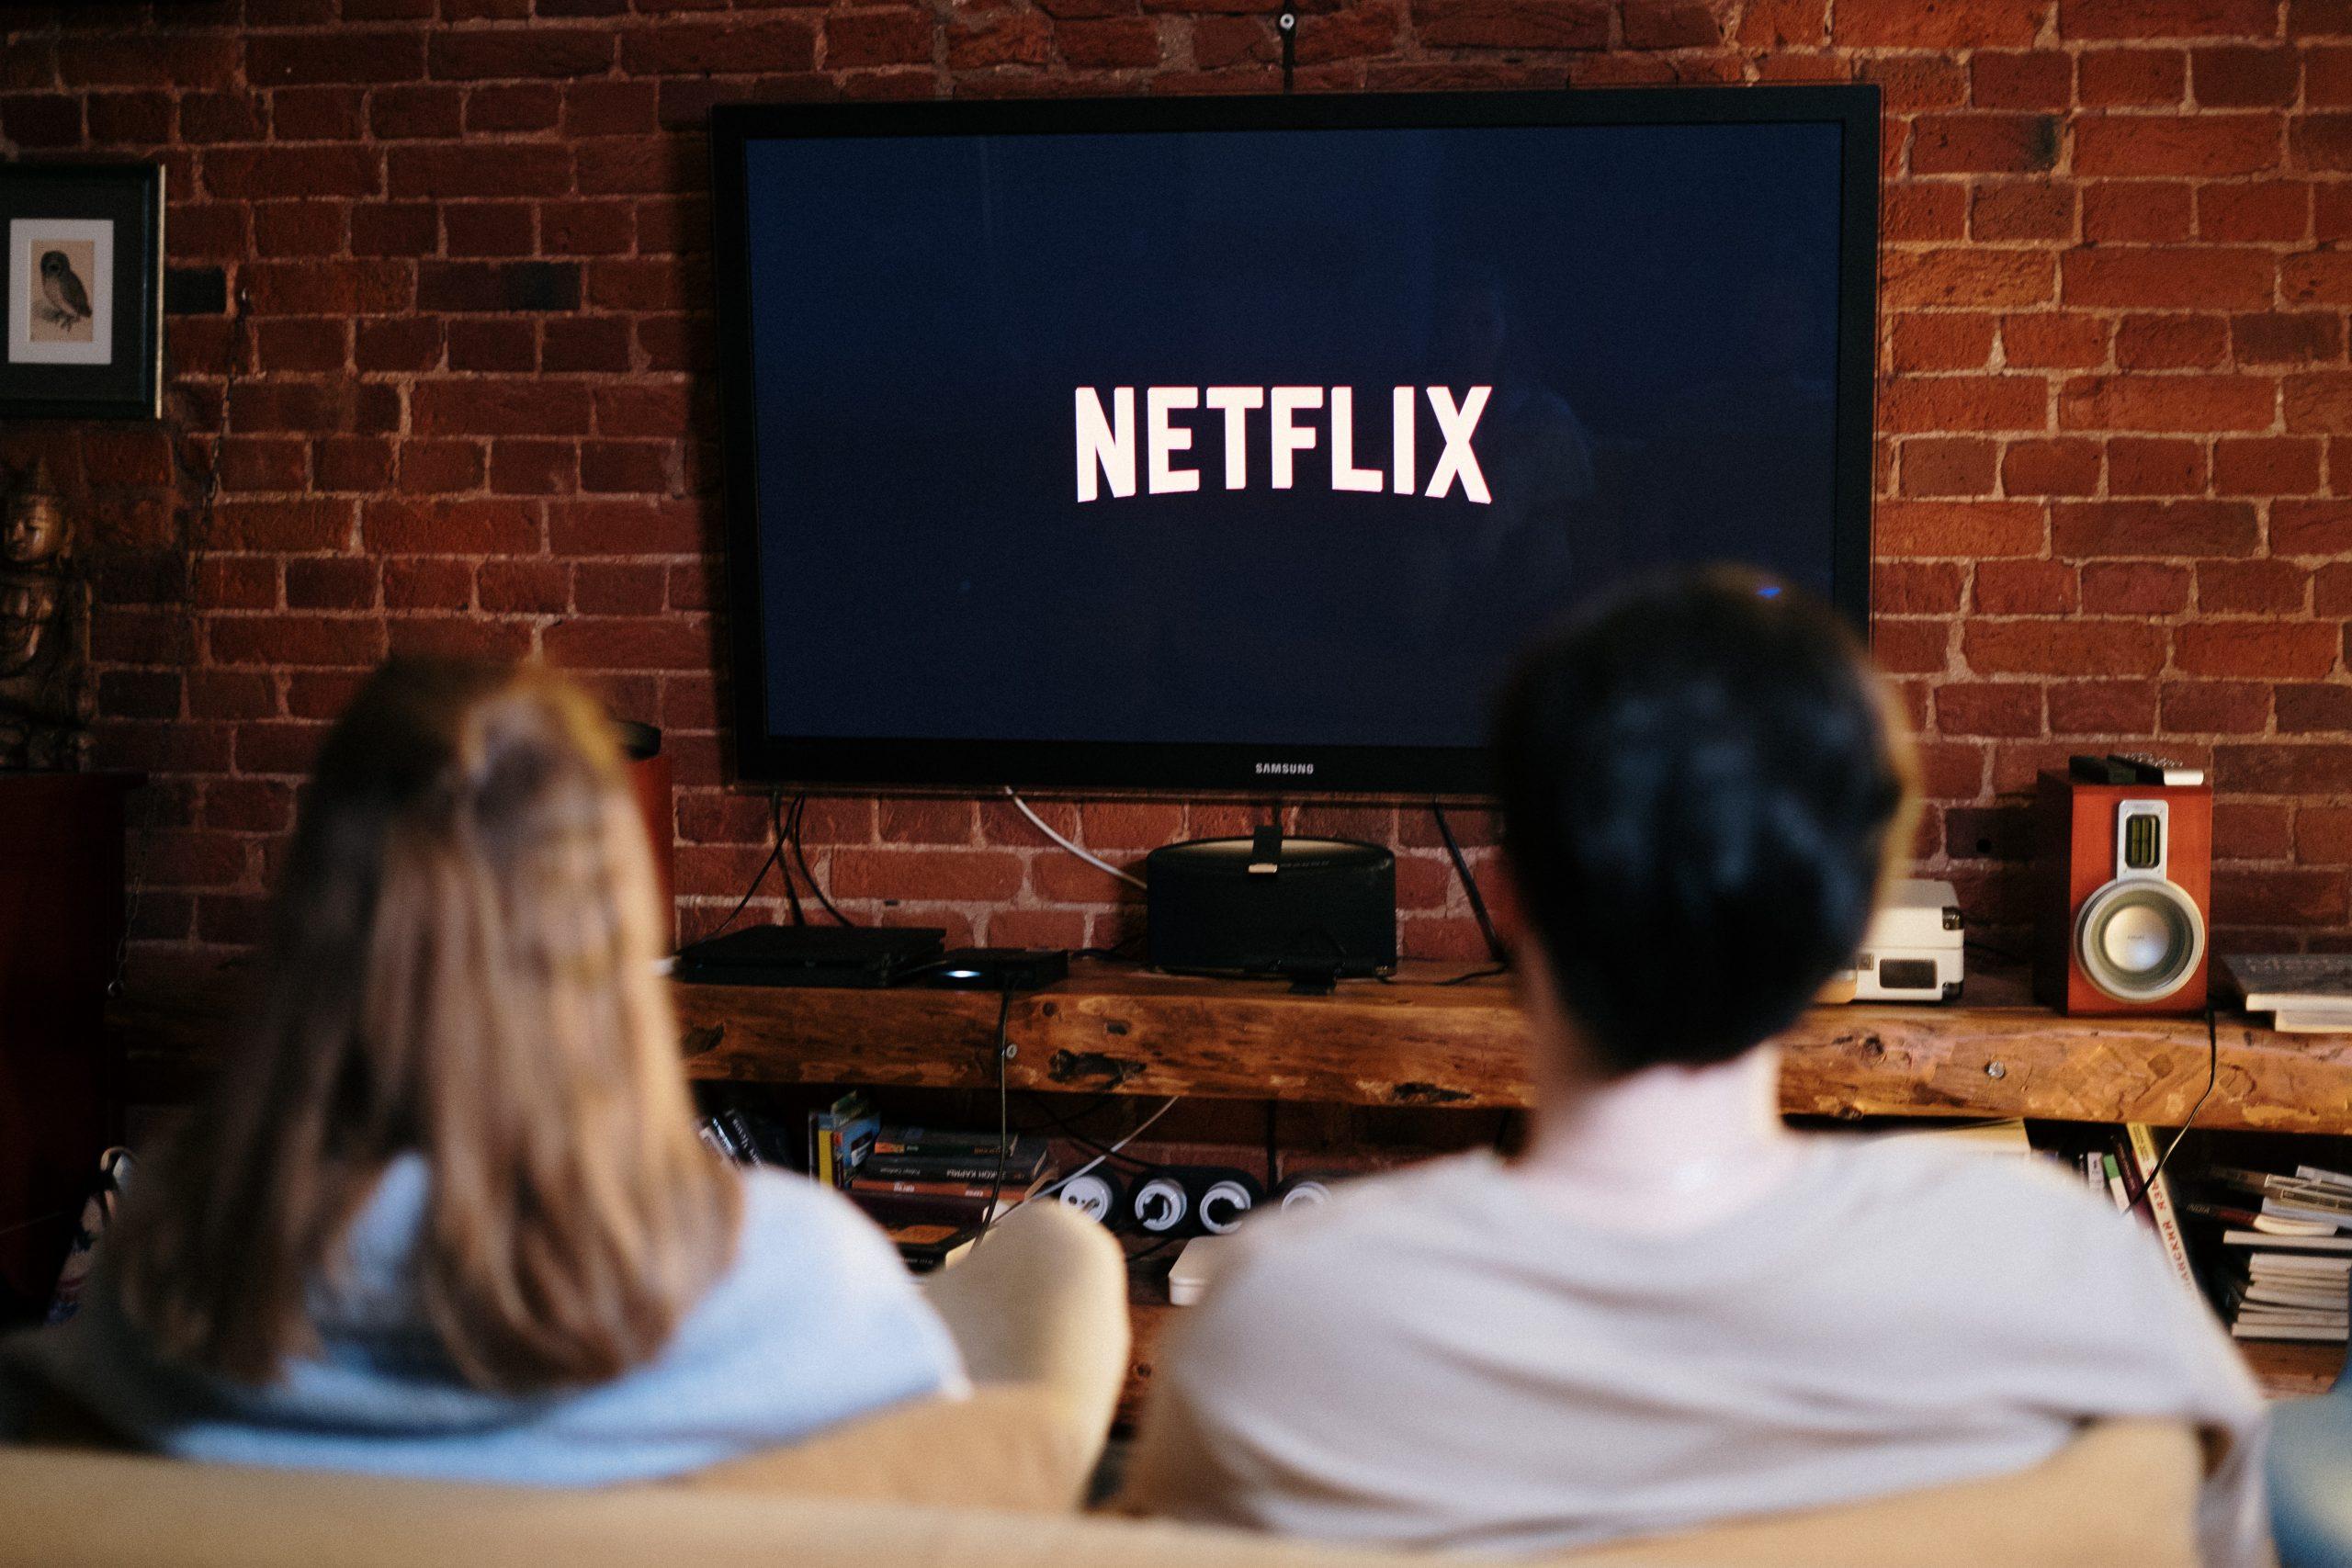 Pareja viendo Netflix en Smart TV